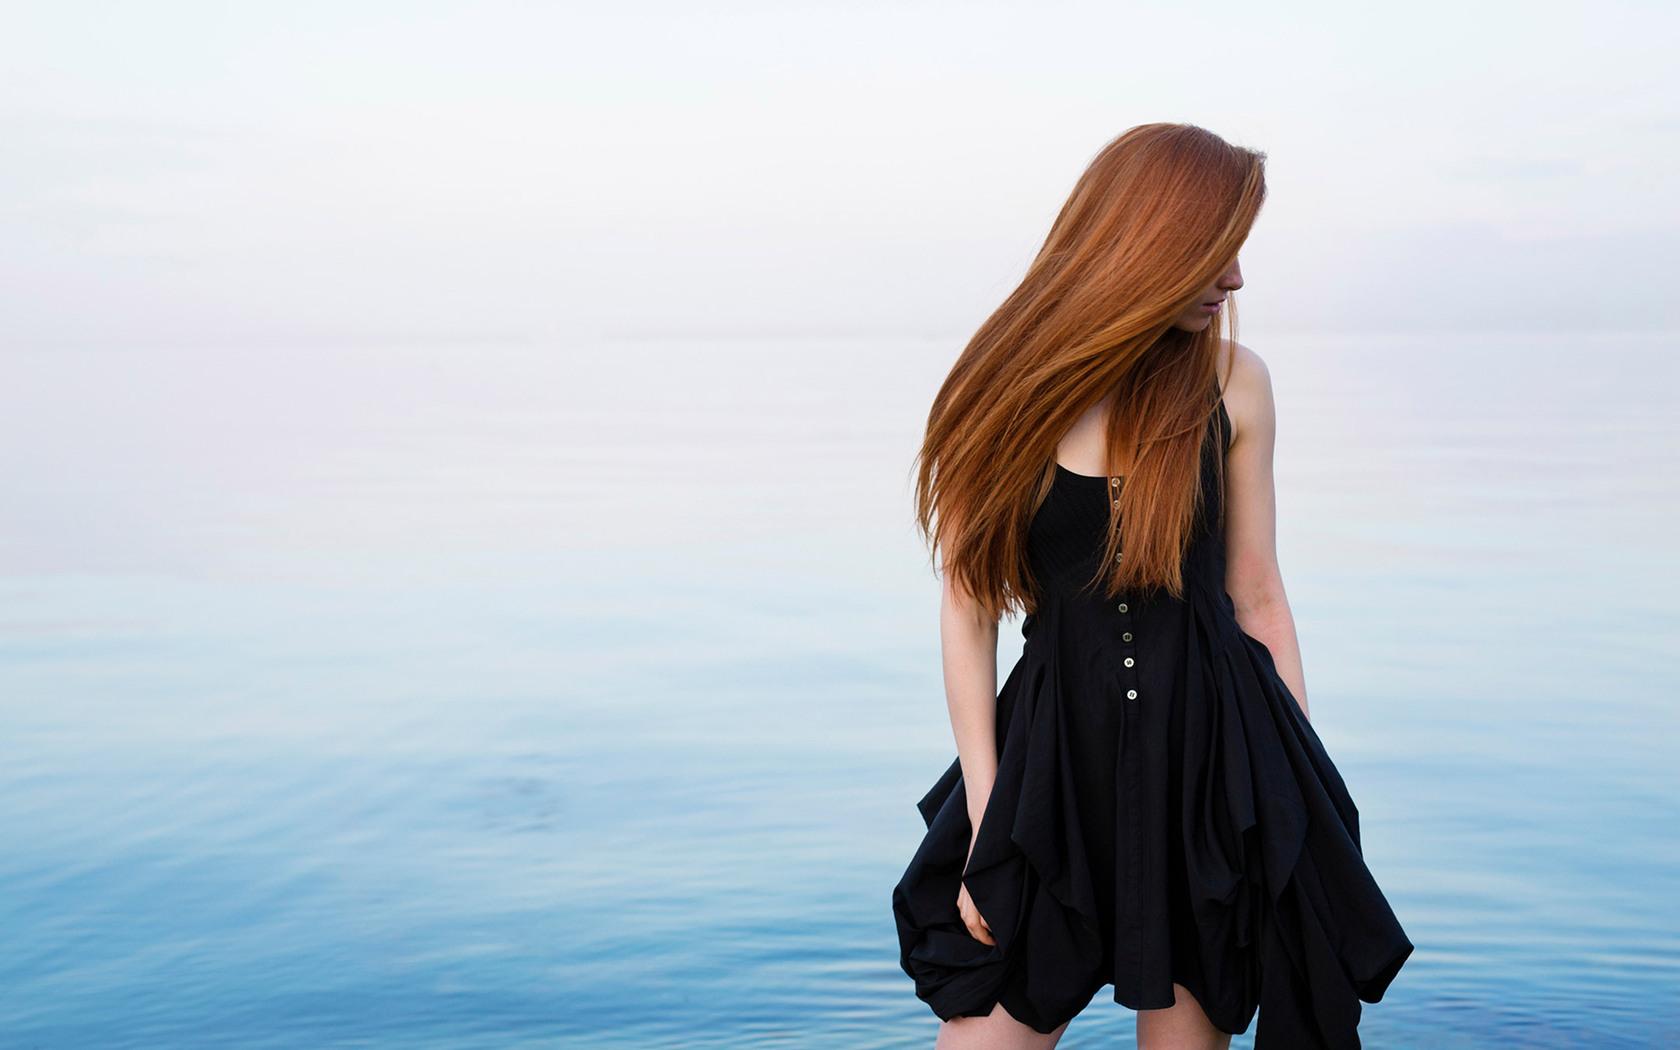 red-head-beauty-outdoors-qu.jpg